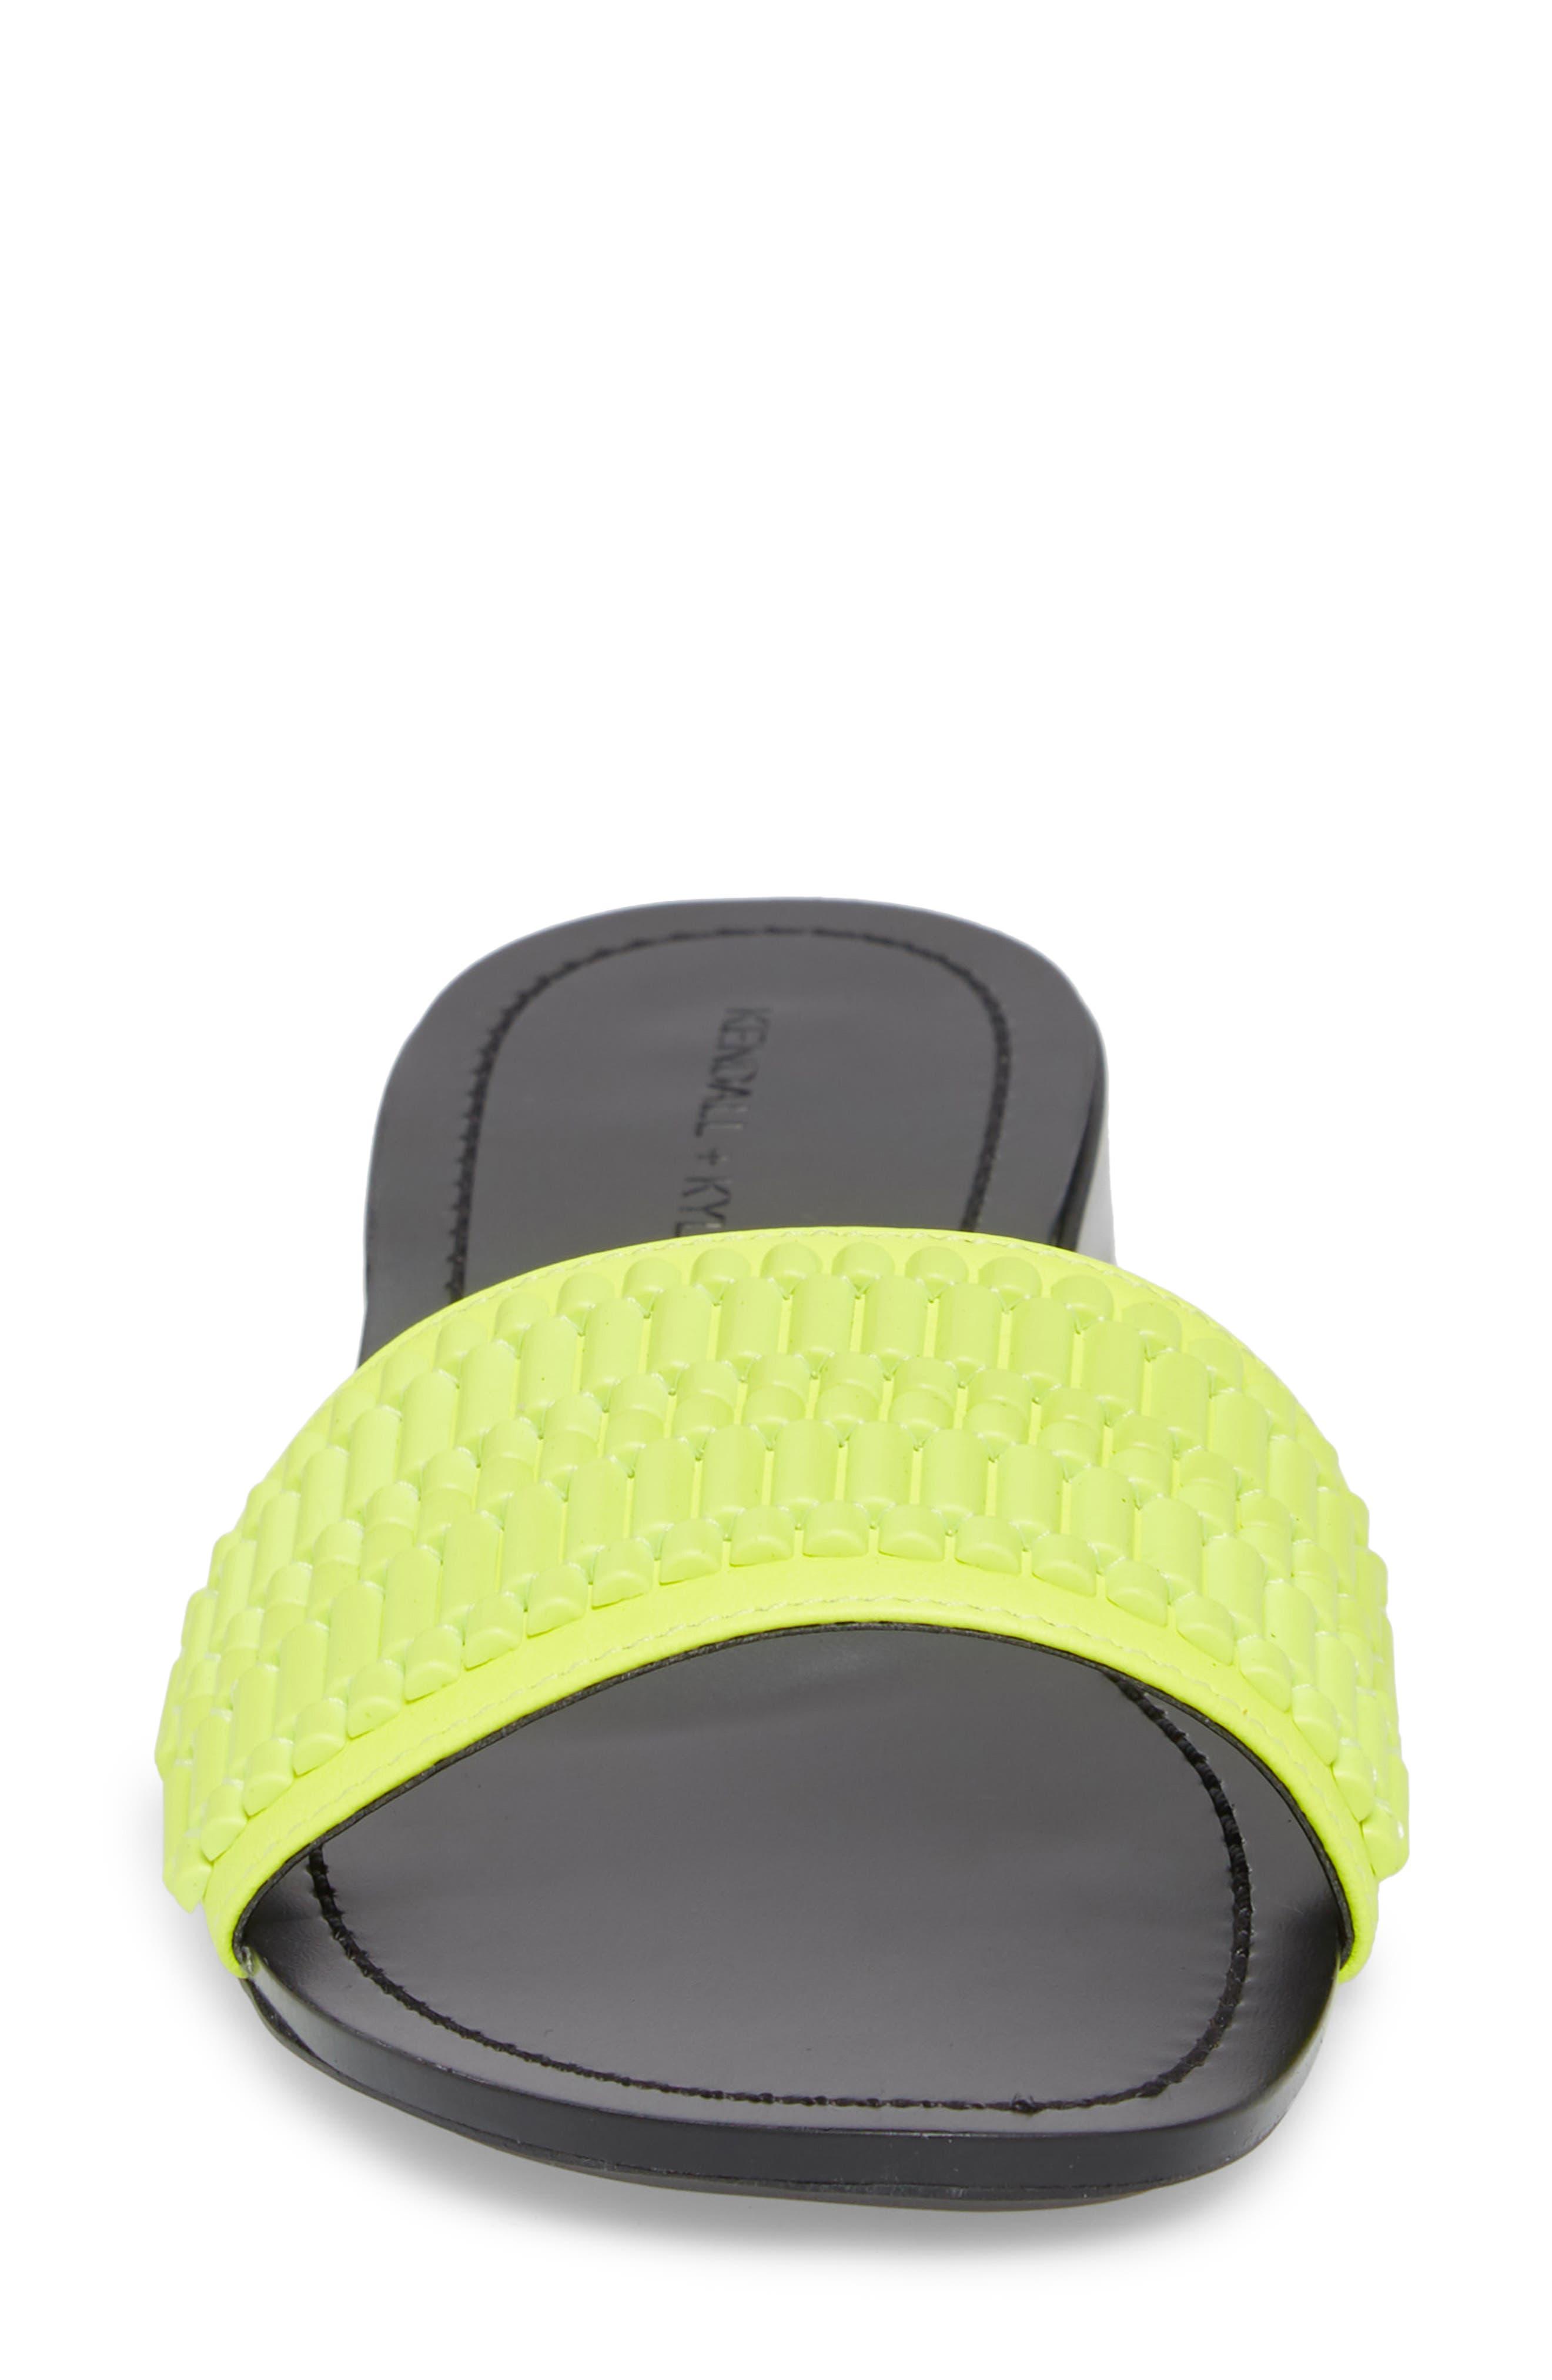 Kennedy Slide Sandal,                             Alternate thumbnail 4, color,                             Fluorescent Yellow/ Yellow